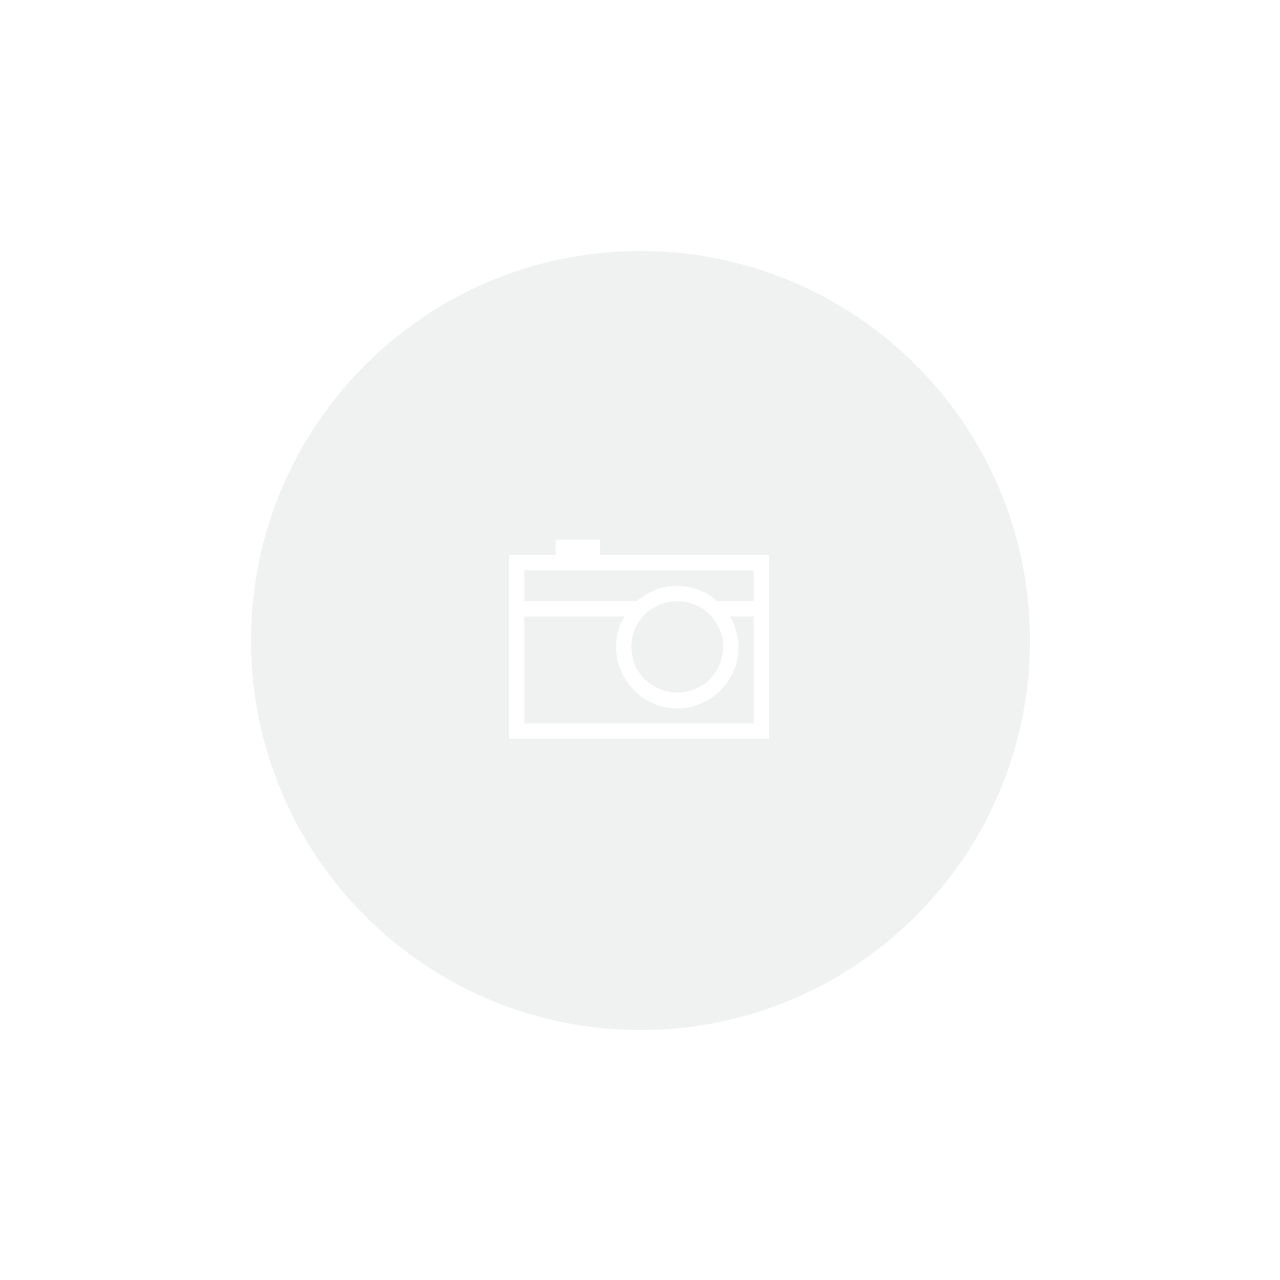 Assadeira Rasa Ret. 34 cm Antiaderente Brasil Tramontina